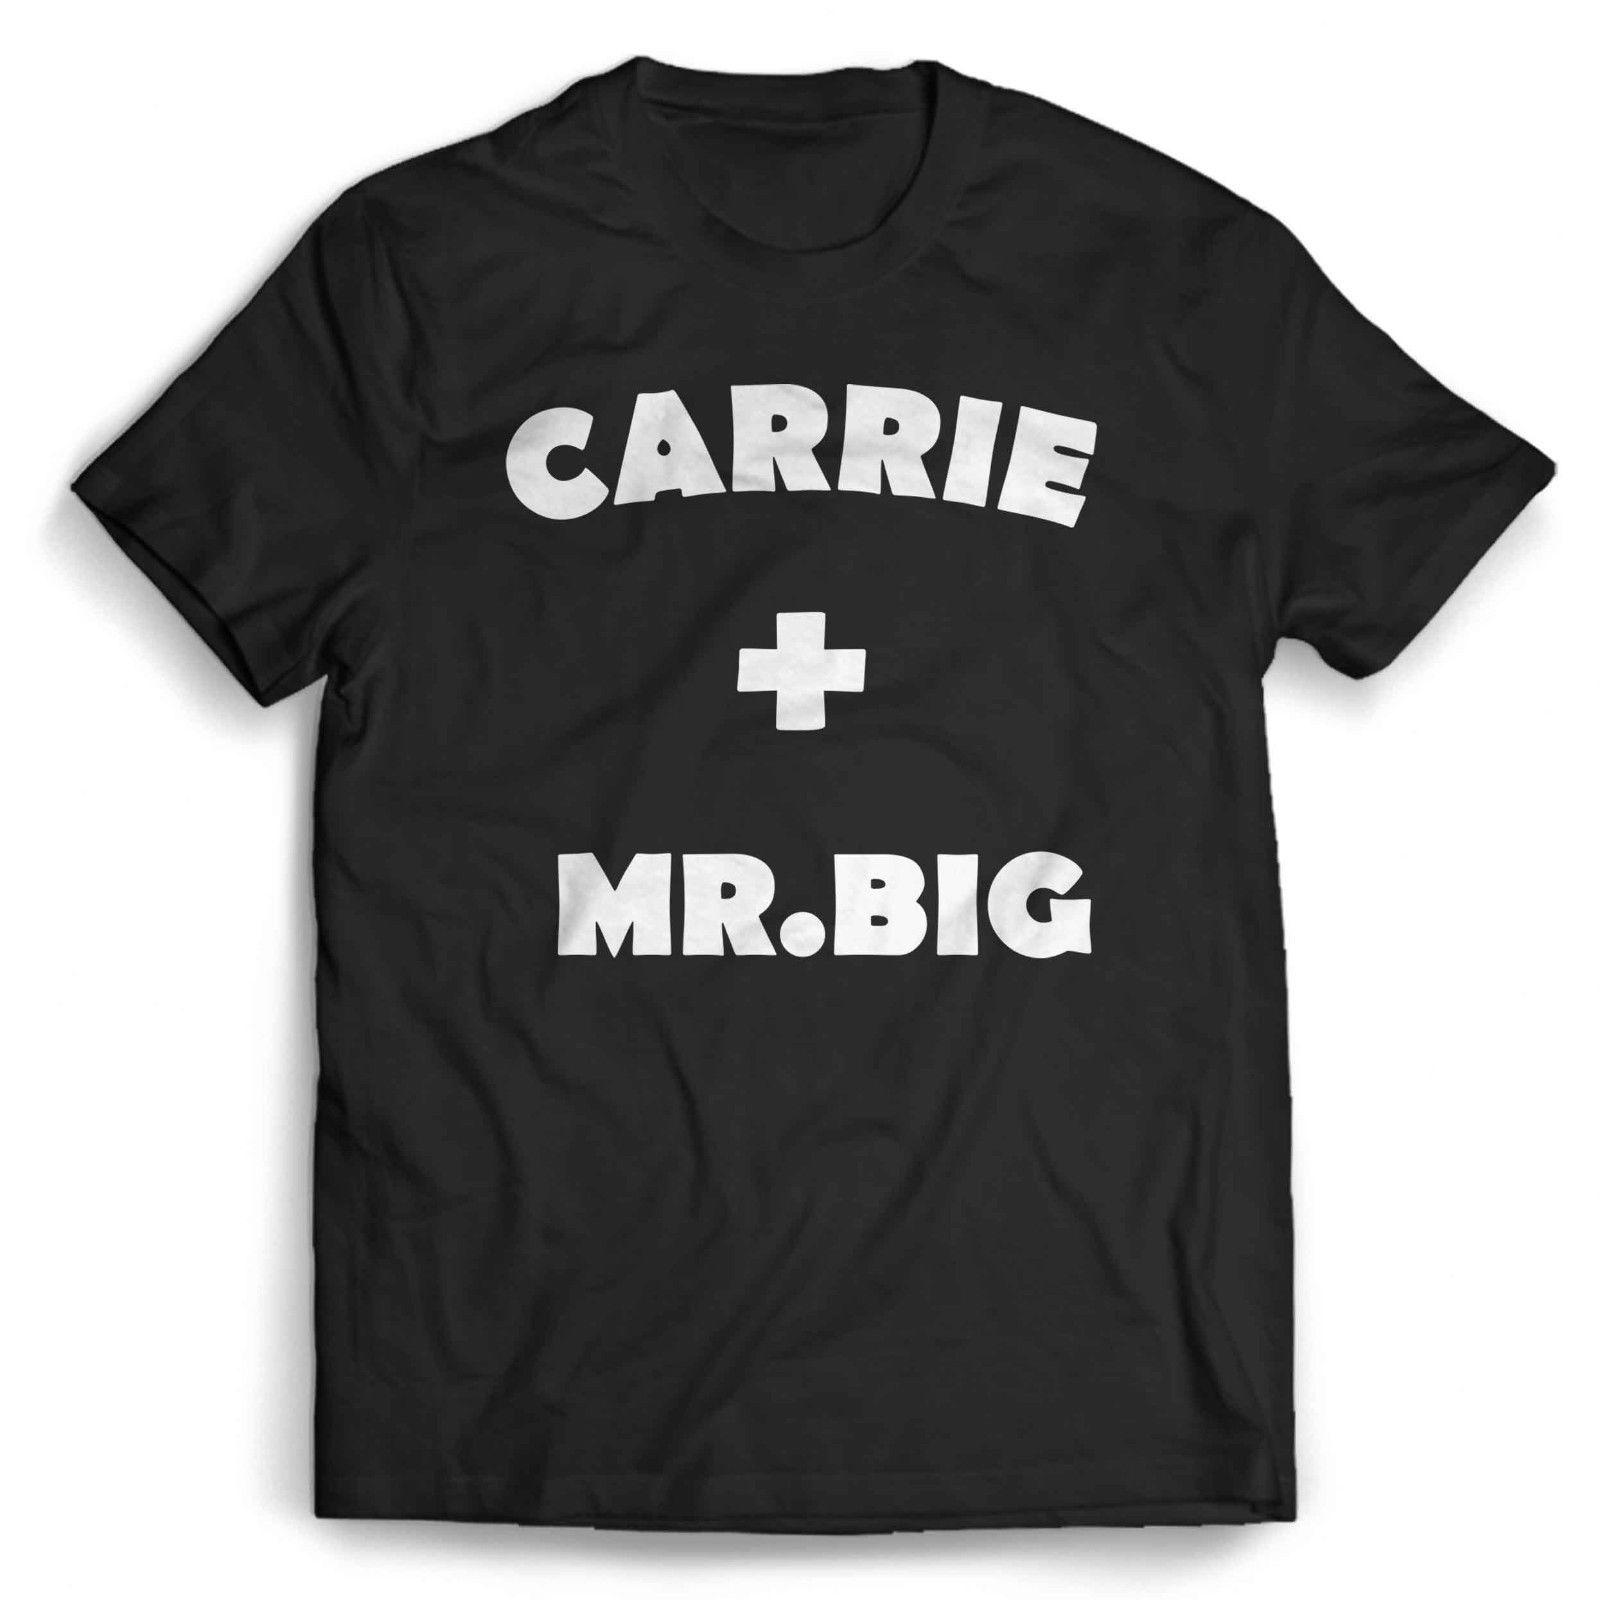 0335e2baf1f Carrie And Mr Big Man S T Shirt O Neck Fashion Printed Mens Cotton T Shirt  24 Hour Tee Shirts T Shirts T Shirts From Guccitshirts